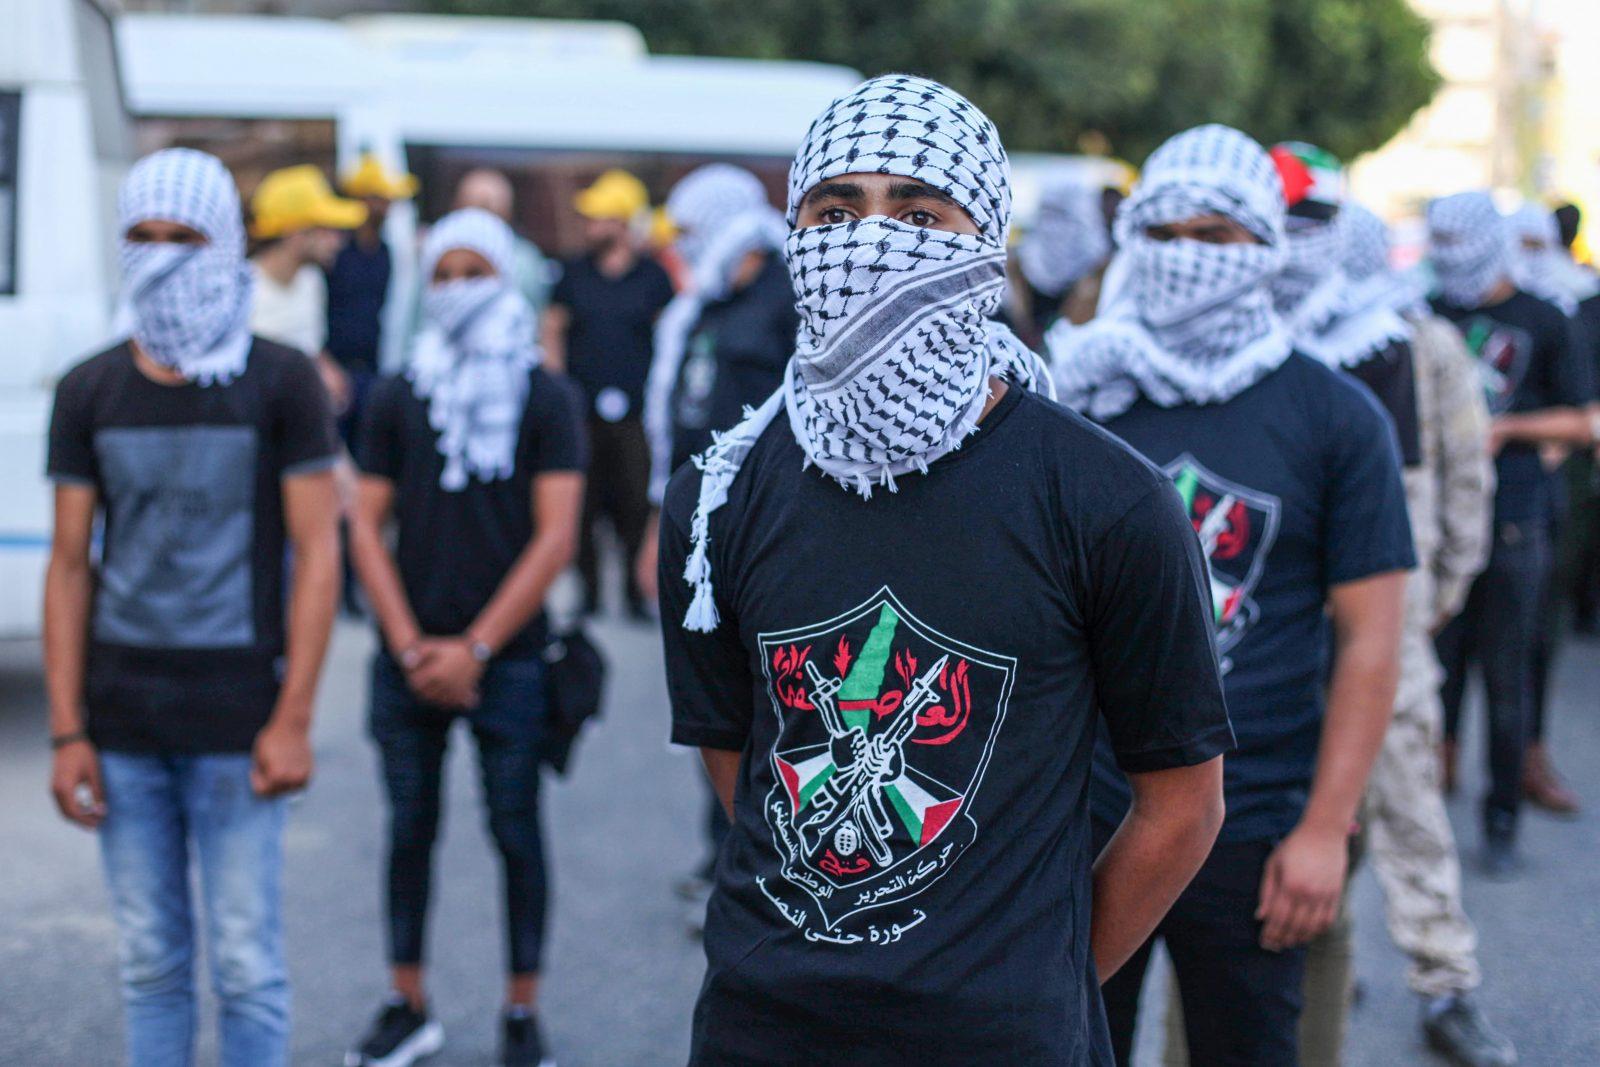 Unterstützer der Fatah Bewegung demonstrieren in Gaza City Foto: picture alliance / ZUMAPRESS.com | Mahmoud Ajjour